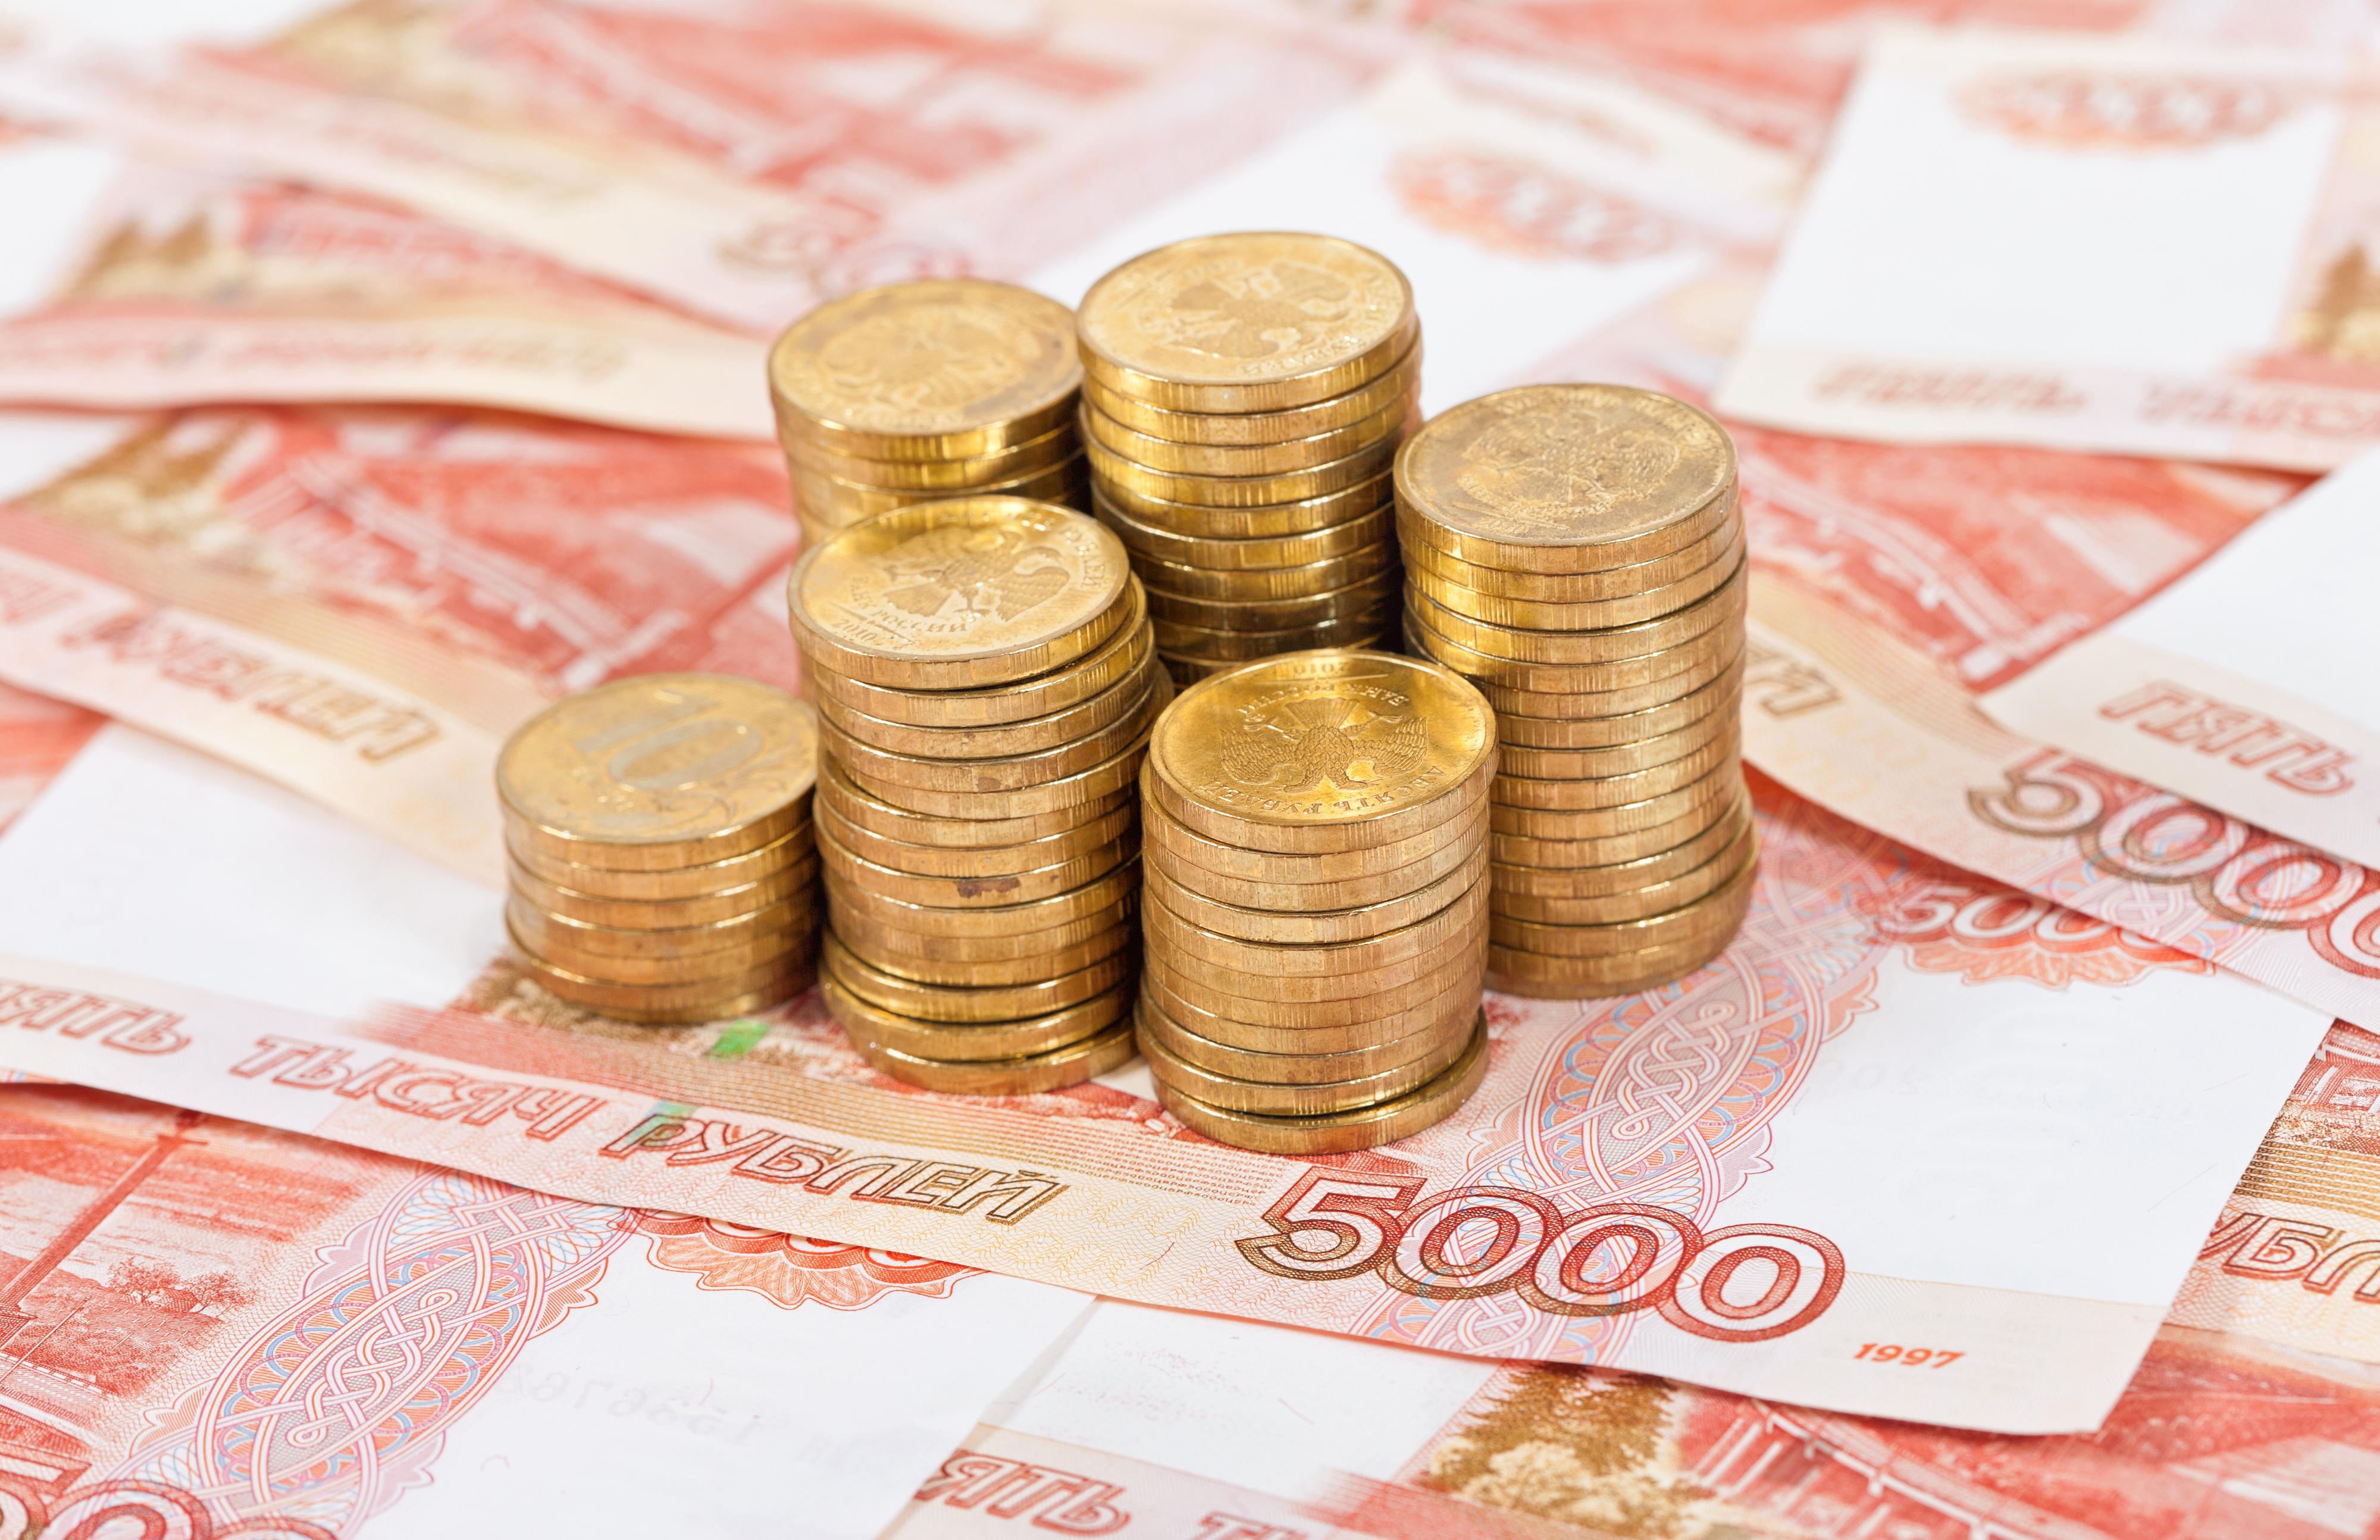 кредит наличными программа онлайн заявка на ипотеку во все банки сразу в нижнем новгороде